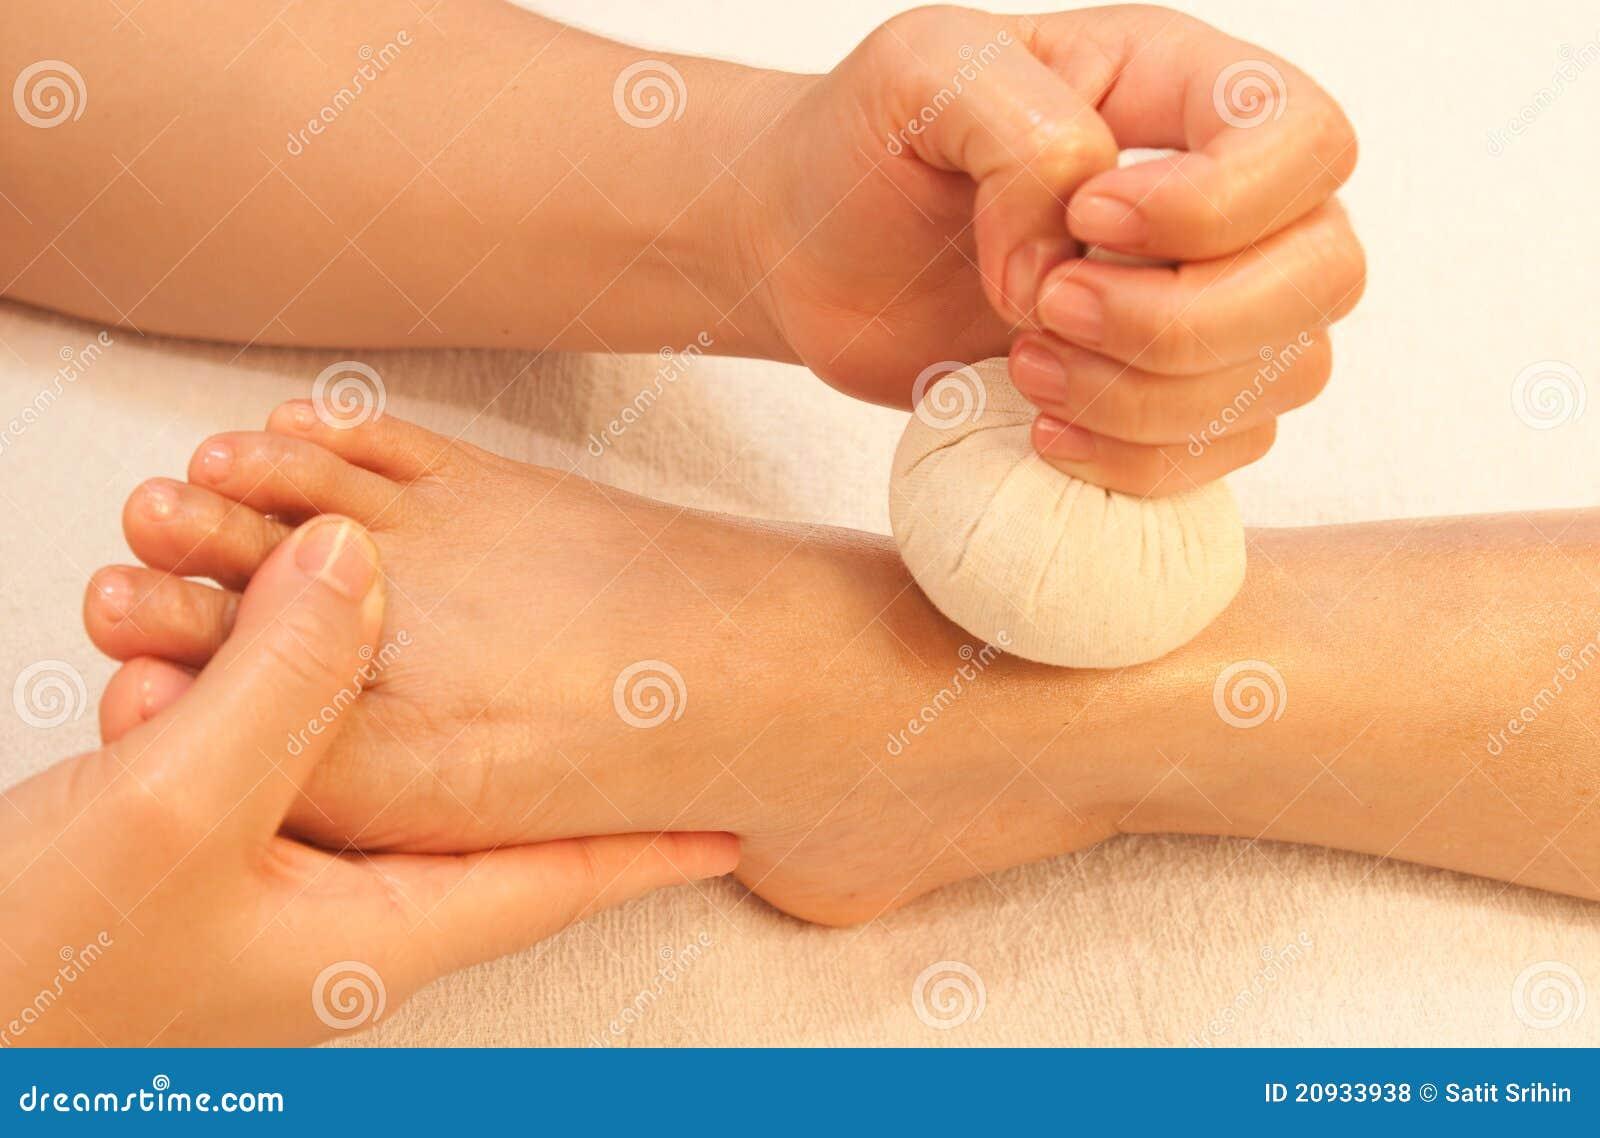 The Risks of a Massage Company